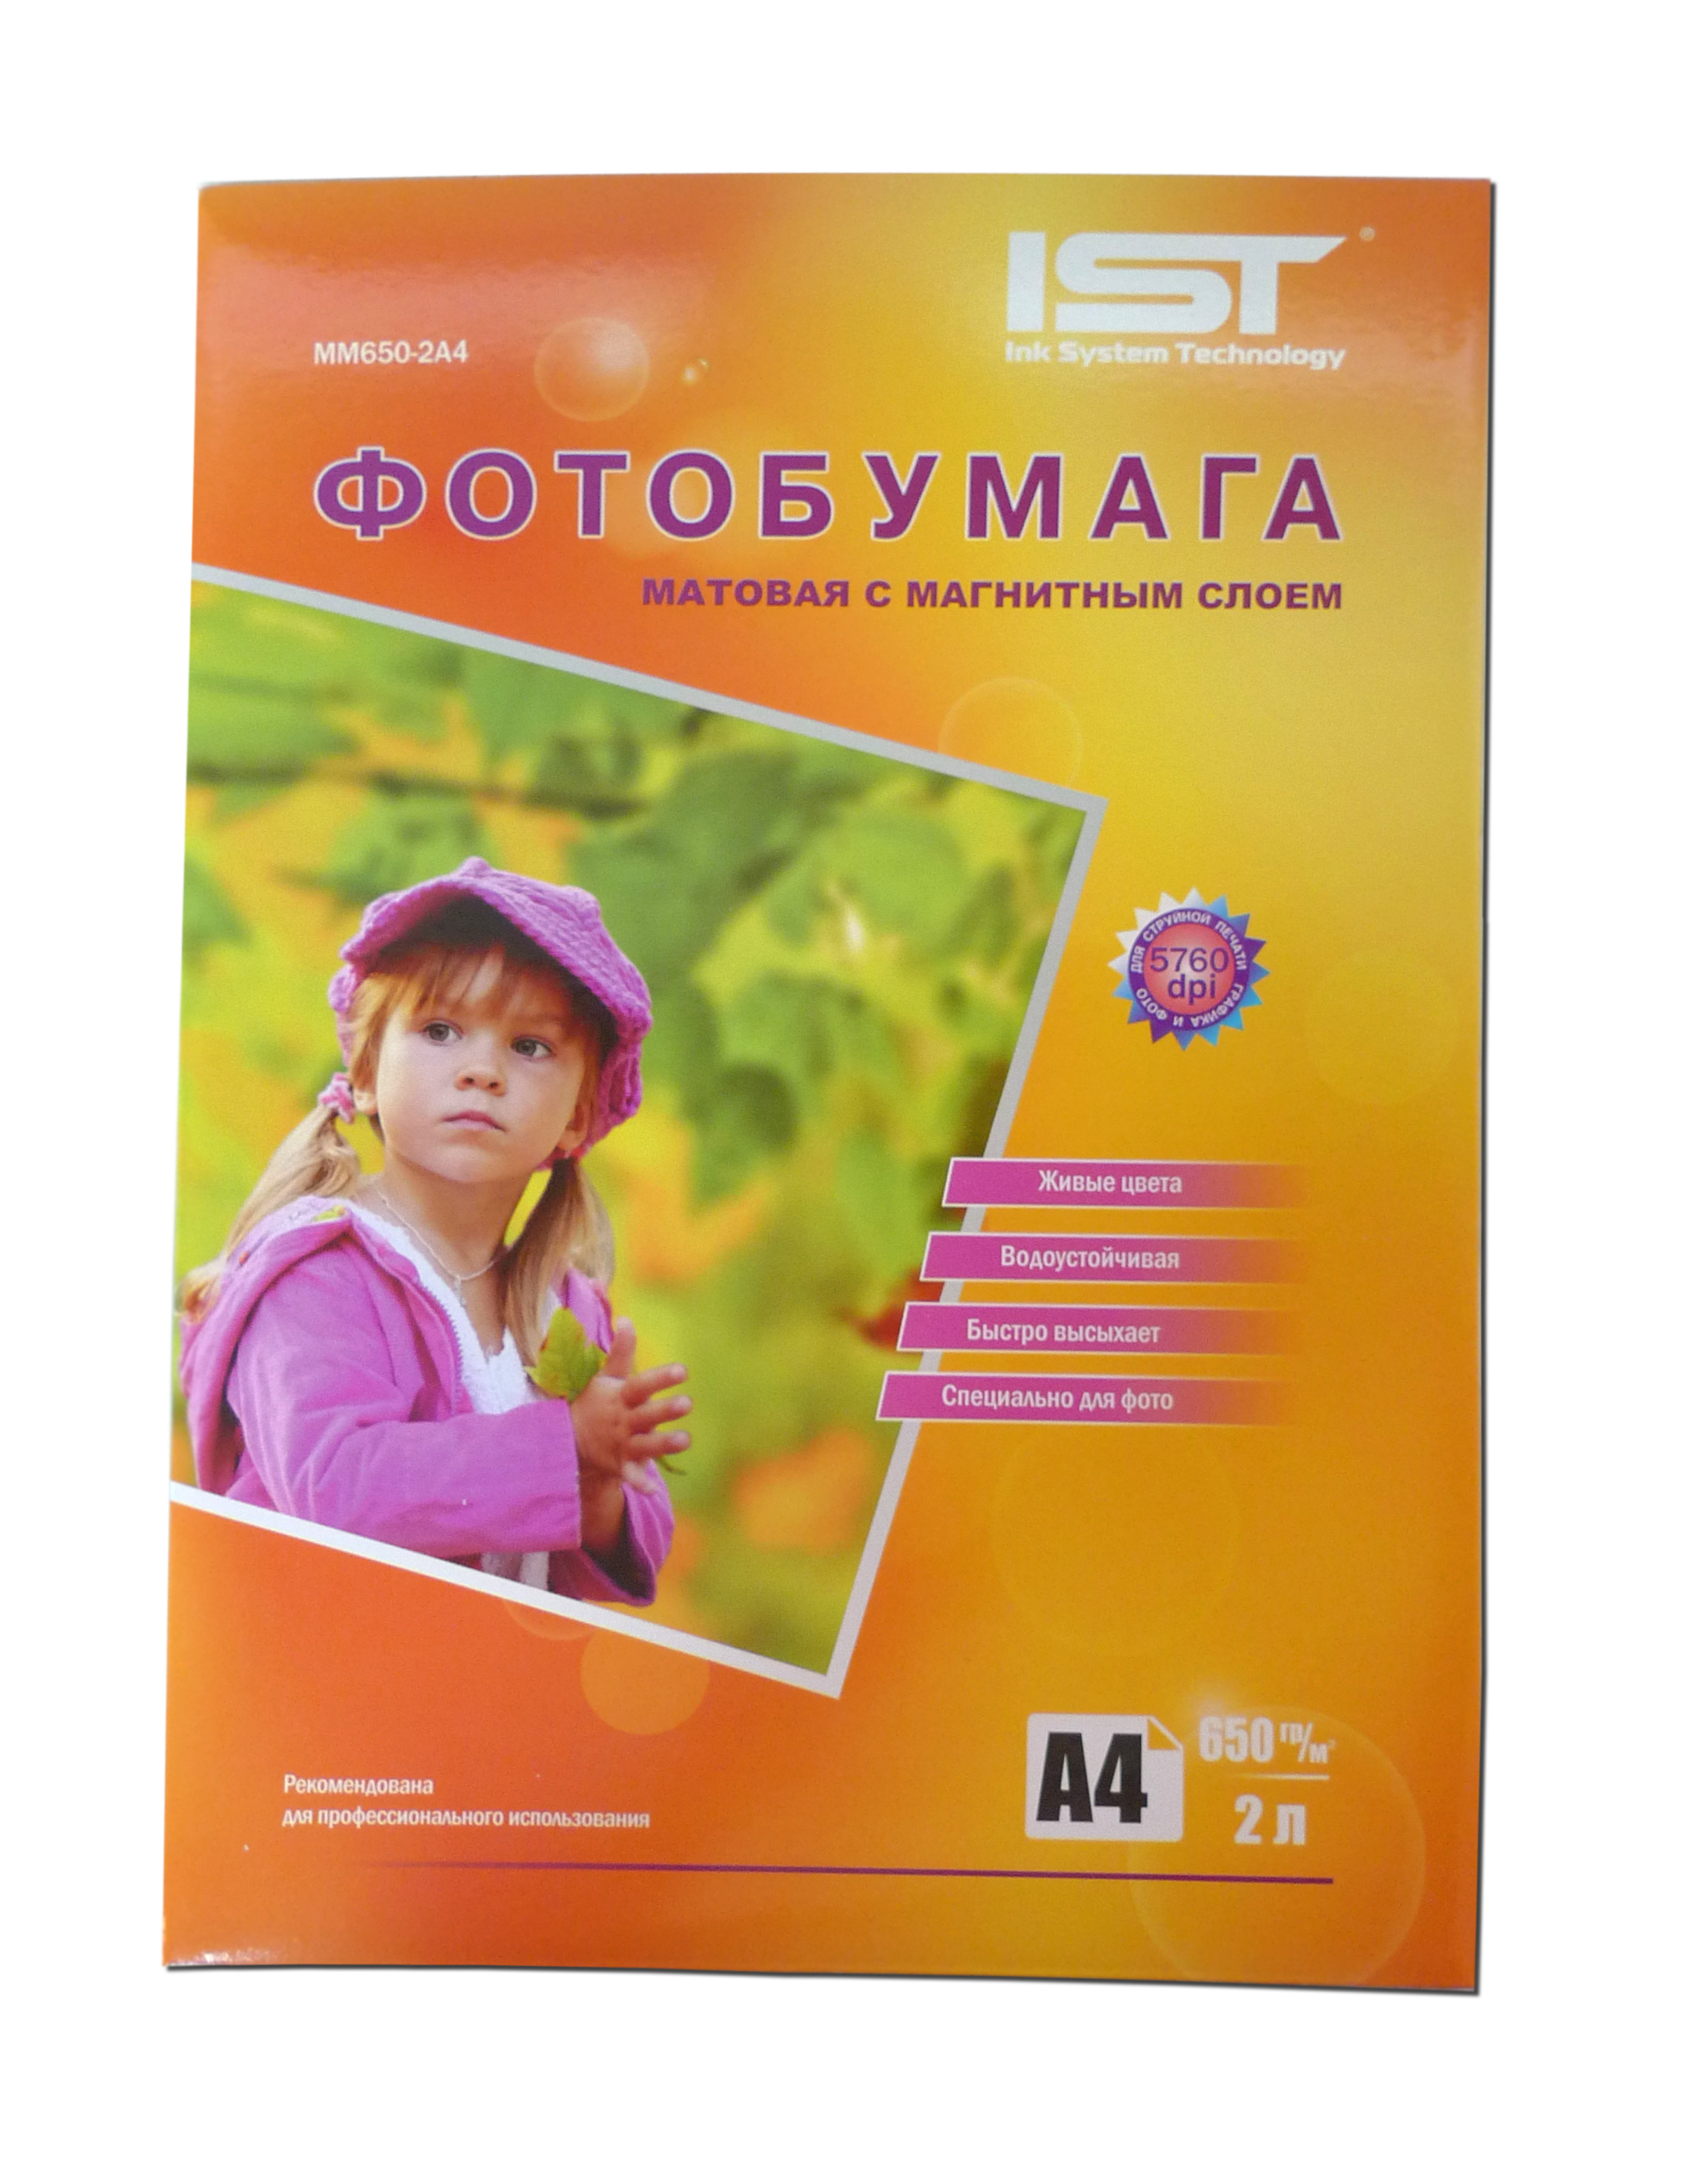 Фотобумага  MM650-2A4